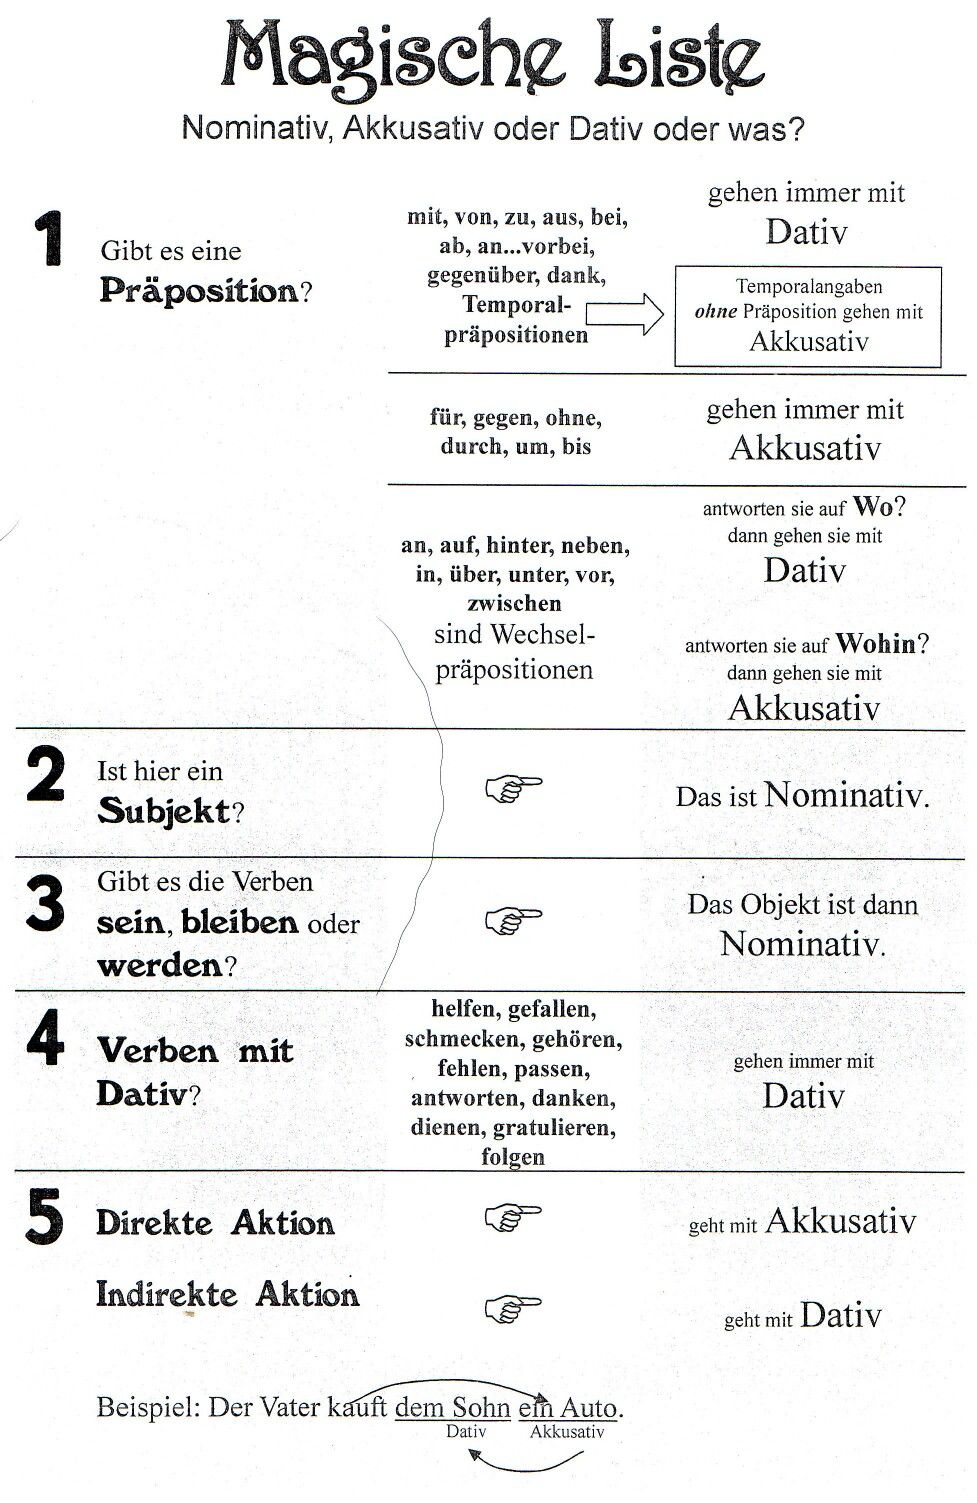 La lista mágica | deutsch | Pinterest | German, German language and ...